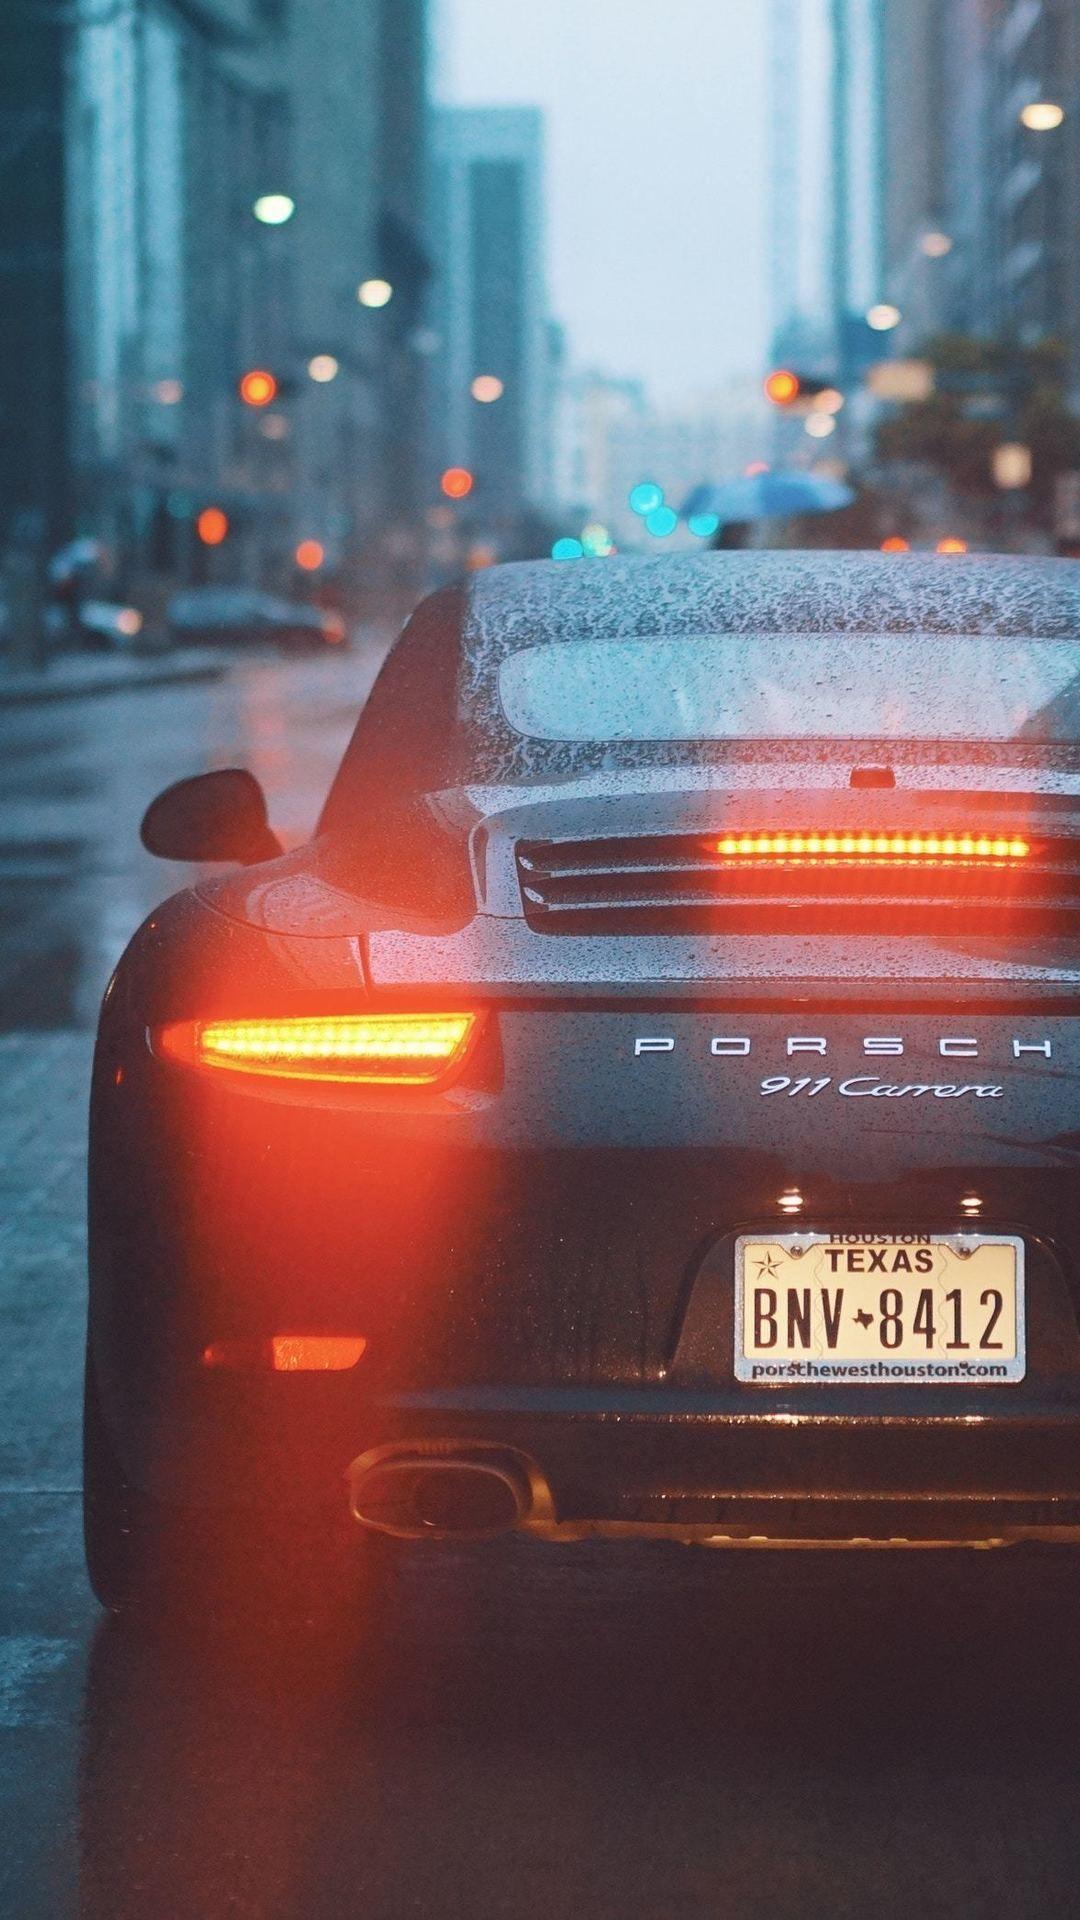 Porsche 911 Carrera Rear Lights Nissan Skyline Porsche 911 Bugatti Veyron